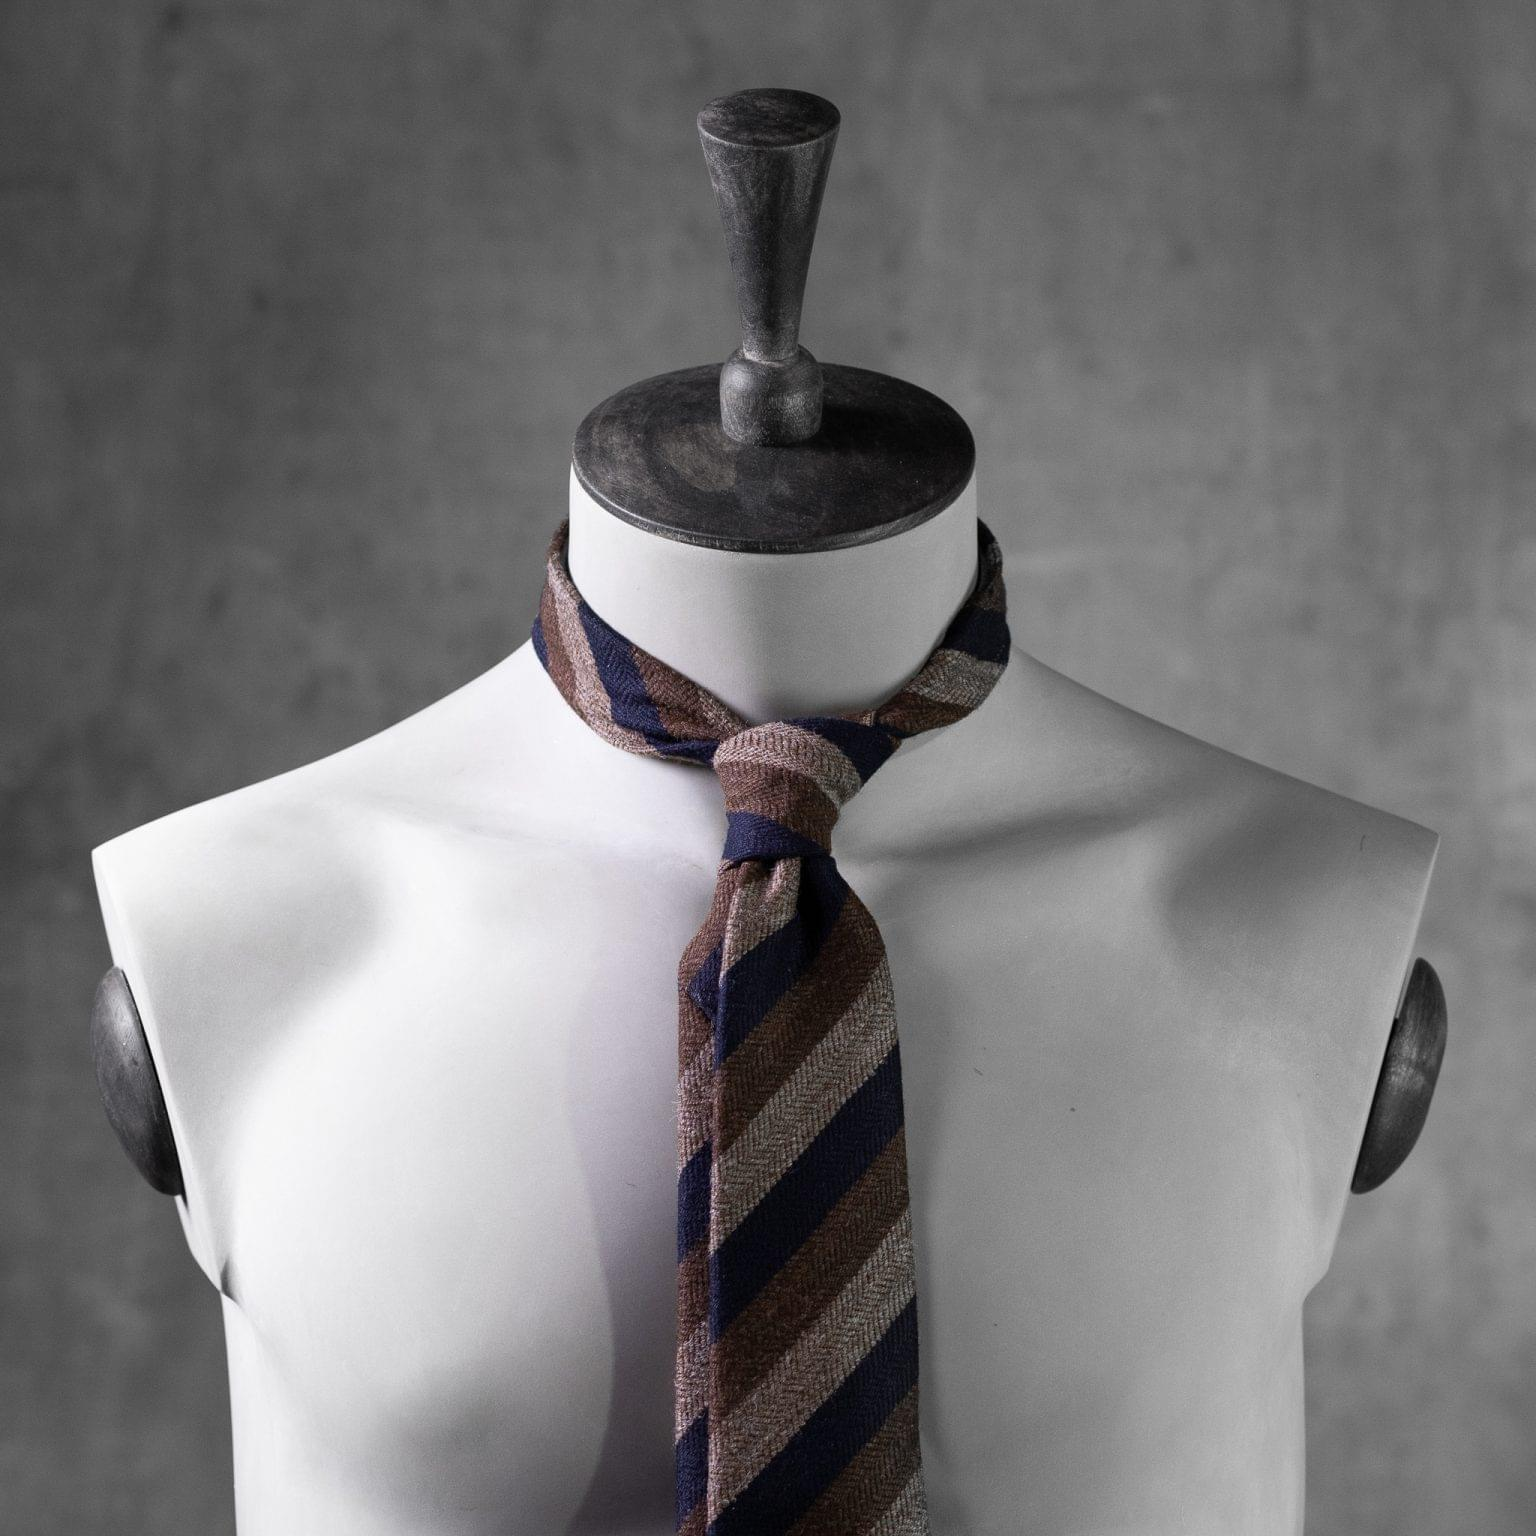 WOOL-LANA-0515-Tie-Initials-Corbata-Iniciales-The-Seelk-3